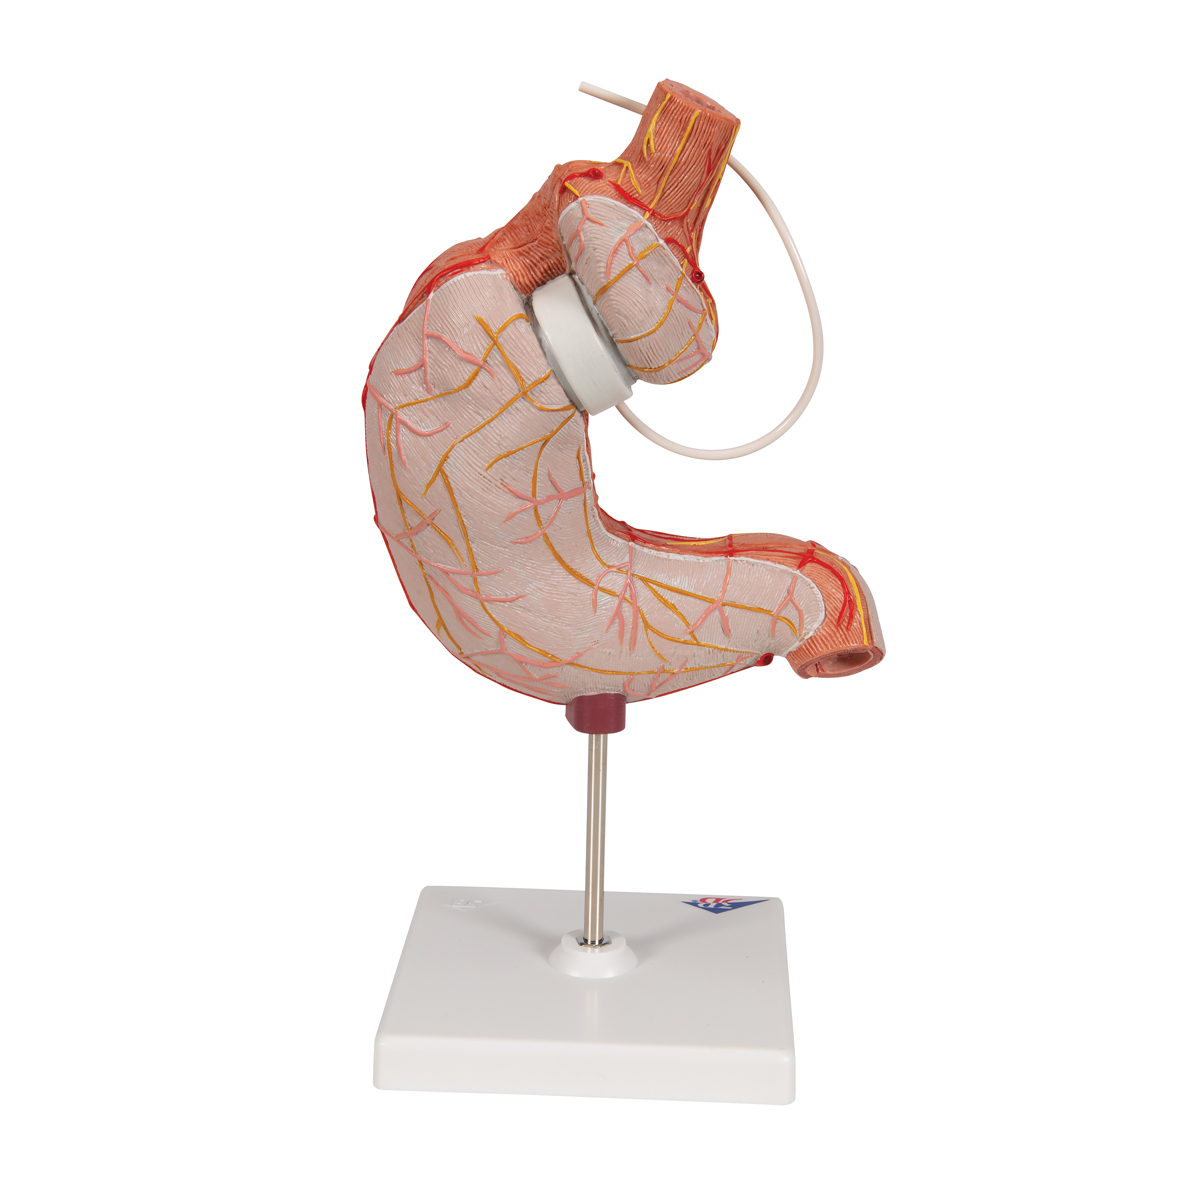 endometrium rák terhesség gyomorrák krukenberg